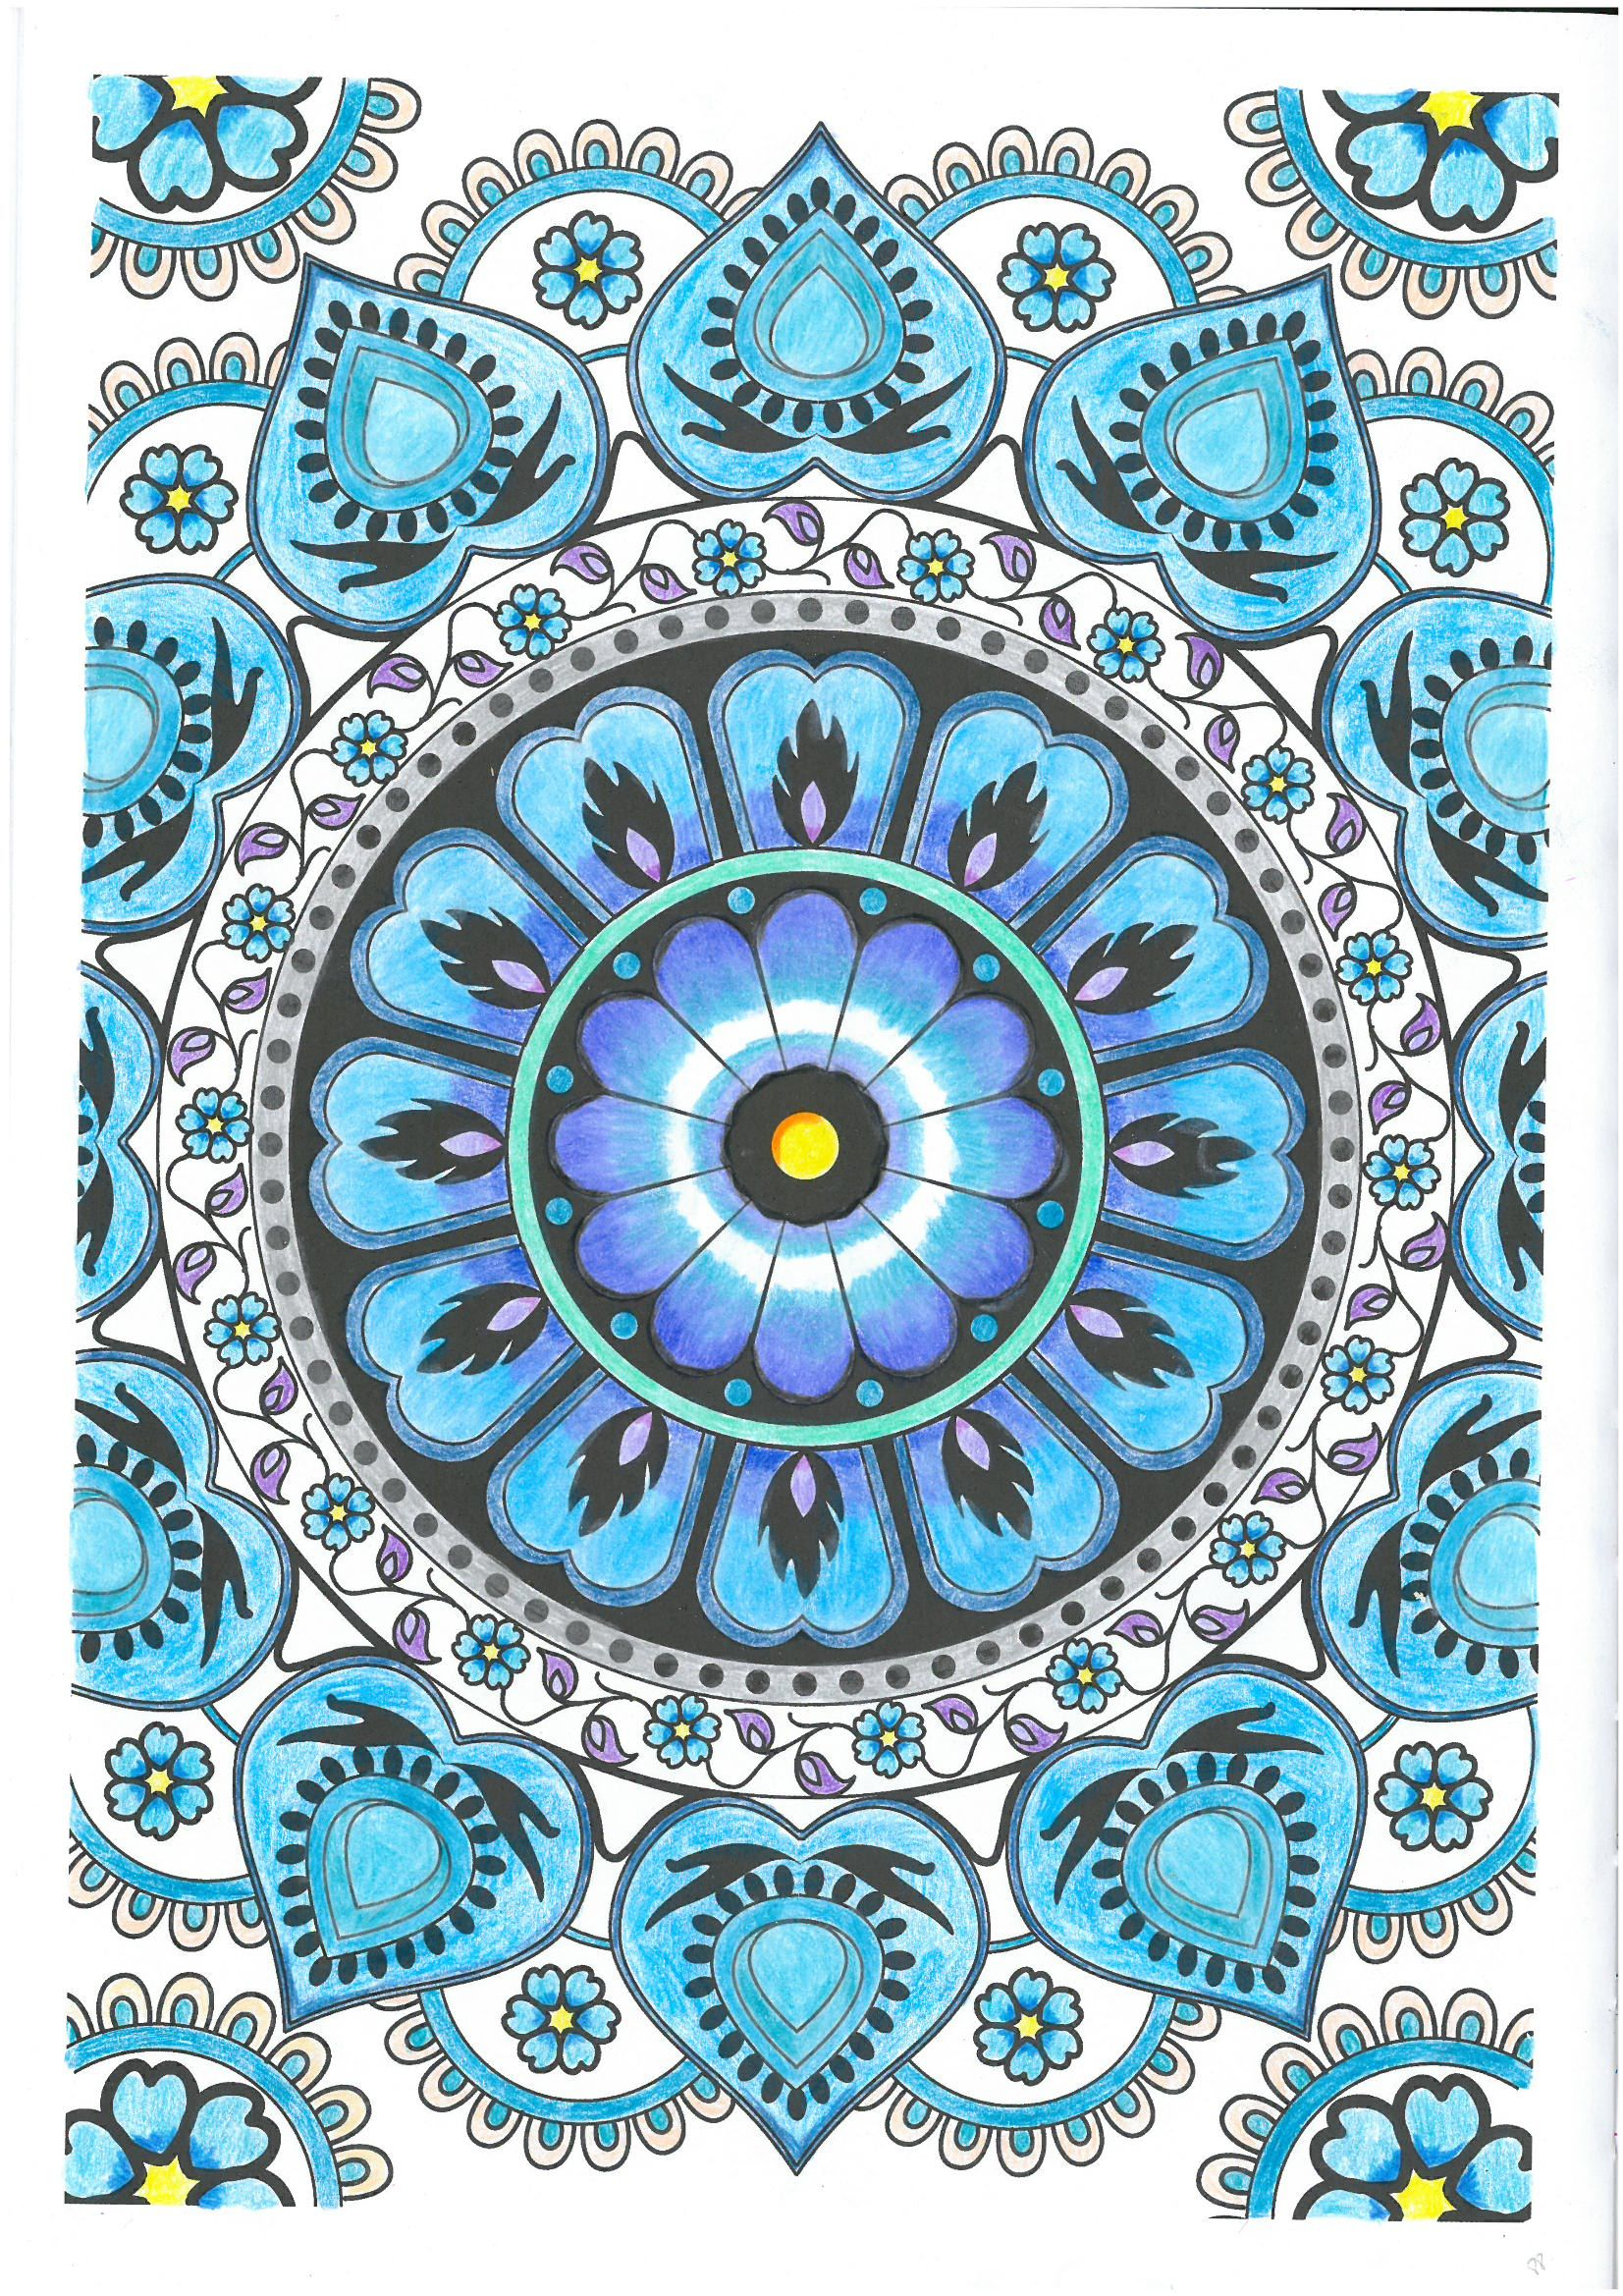 Pag 88, arte terapia, colorir, mandalas, pintado a lápis | Arte ...